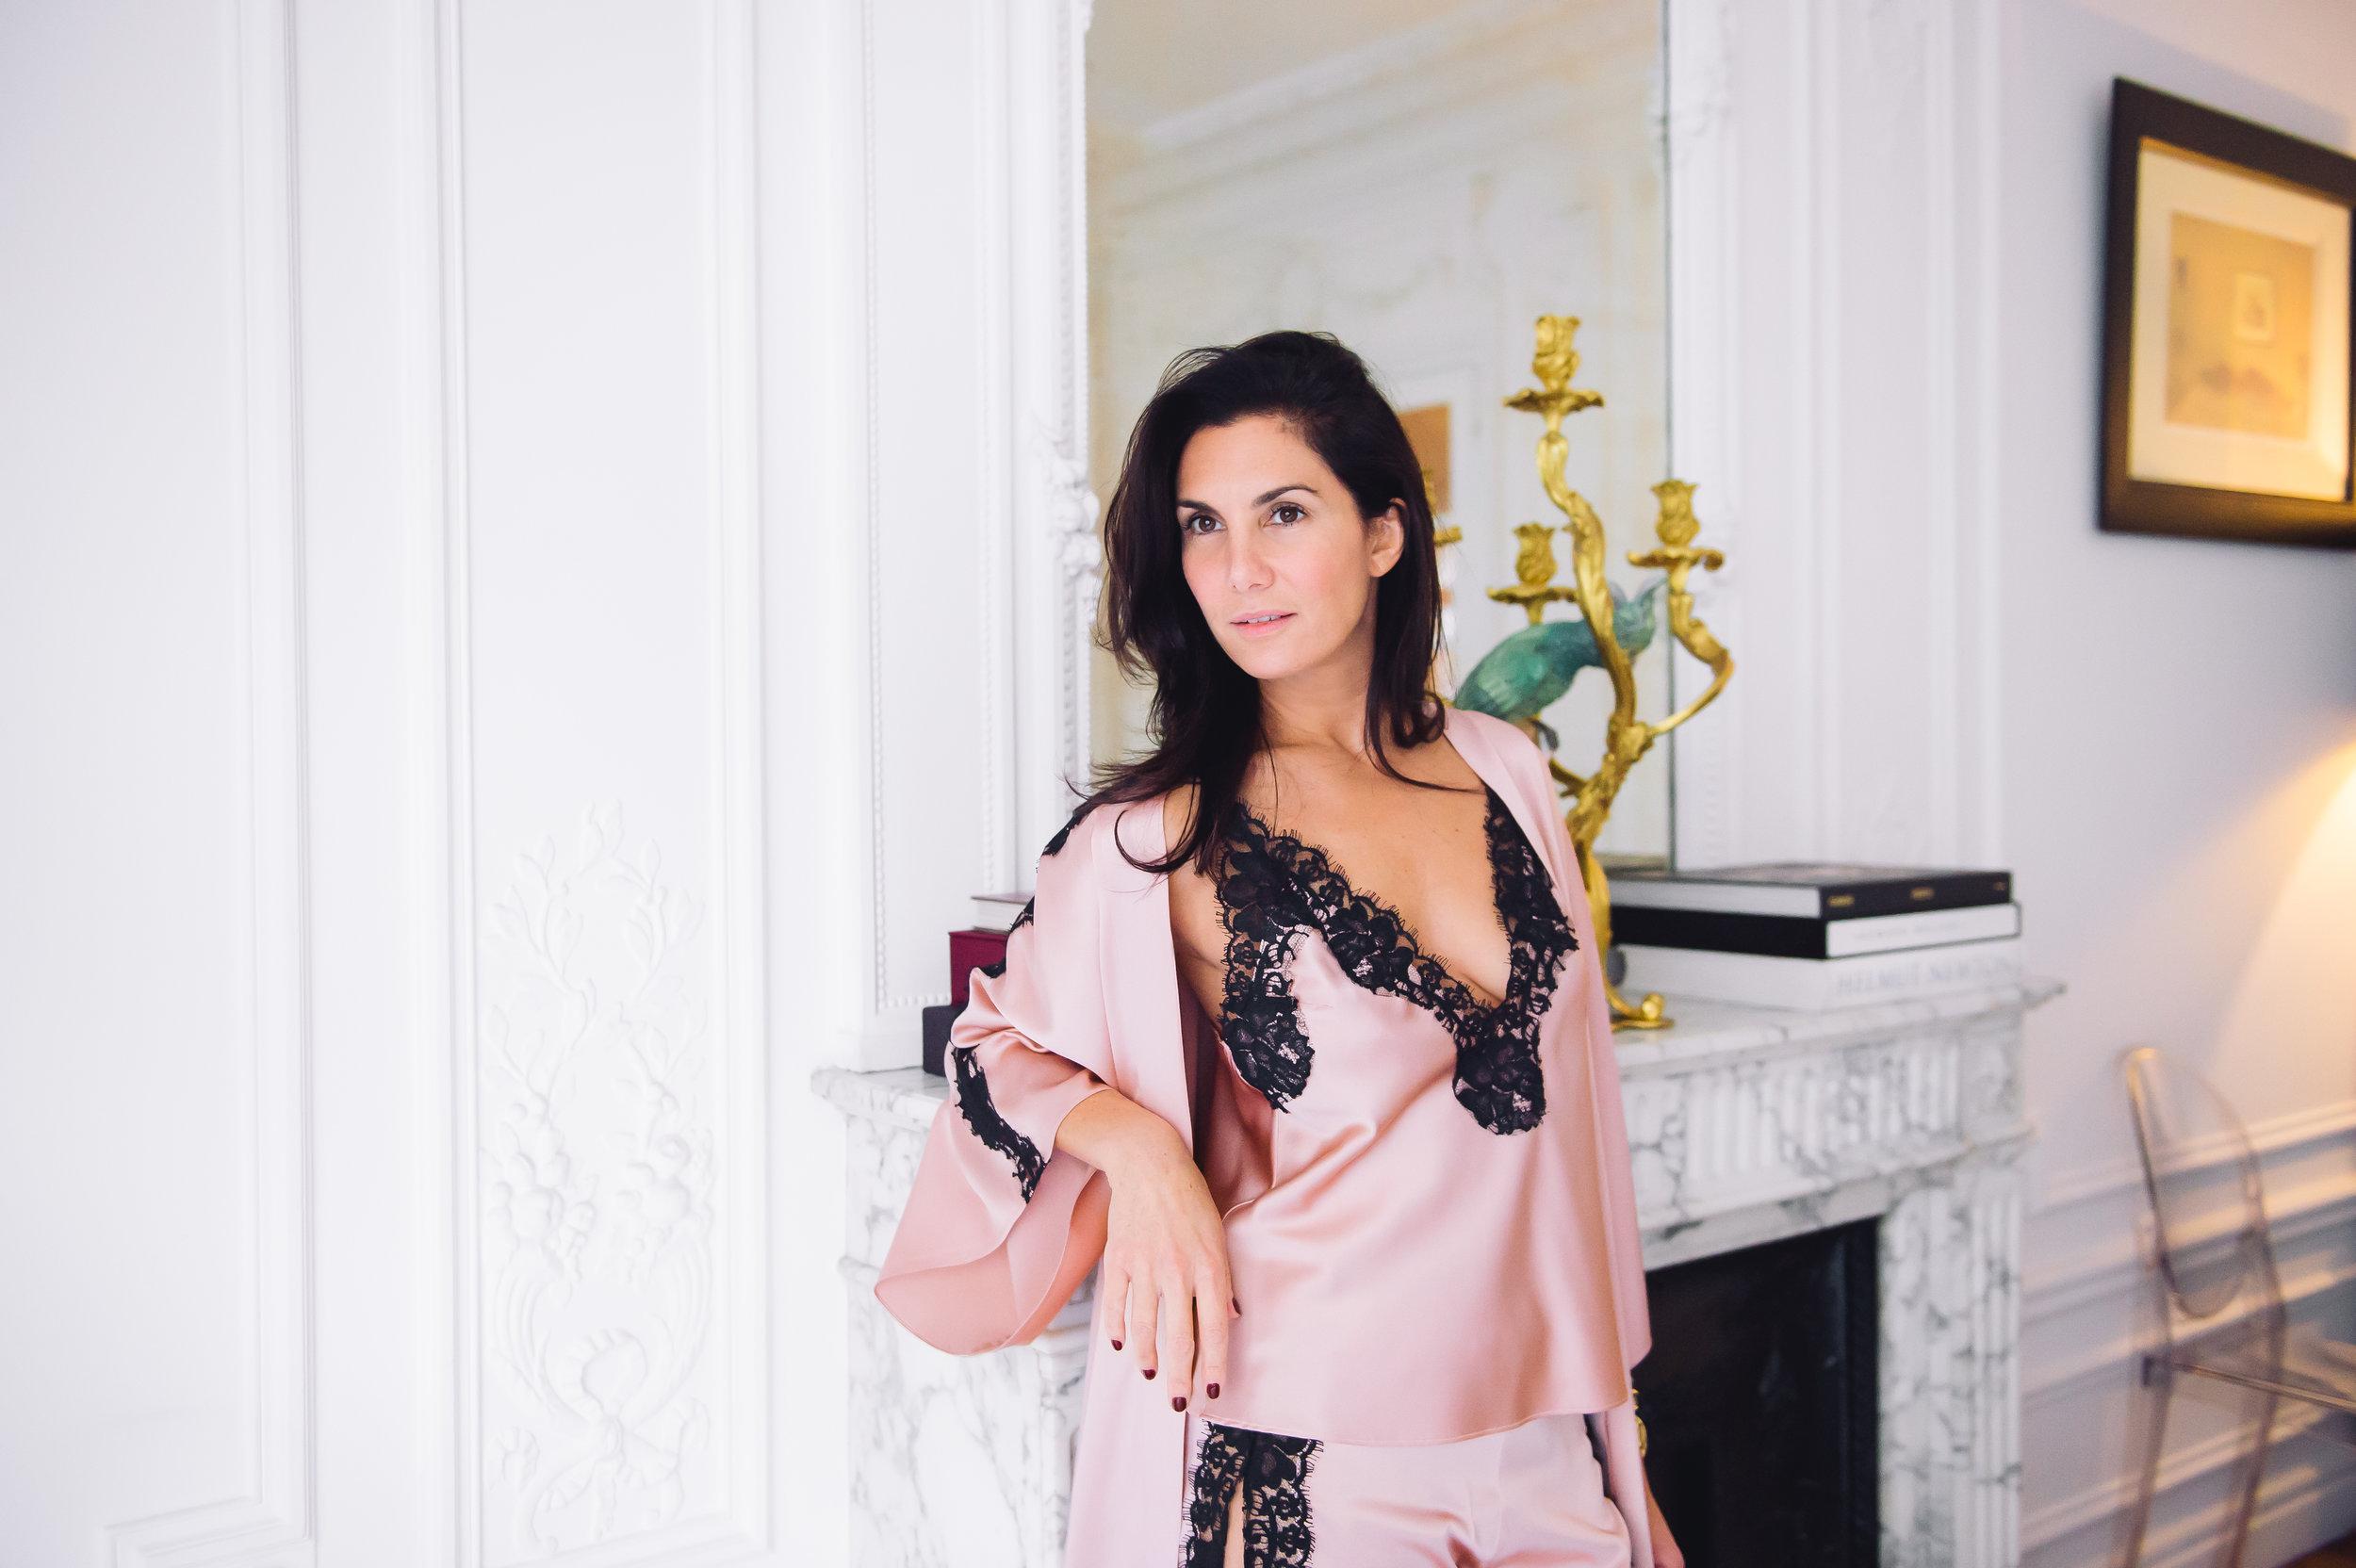 Elisabeth-Jones-Hennessy-Lingerie-Pajama-Paris-03